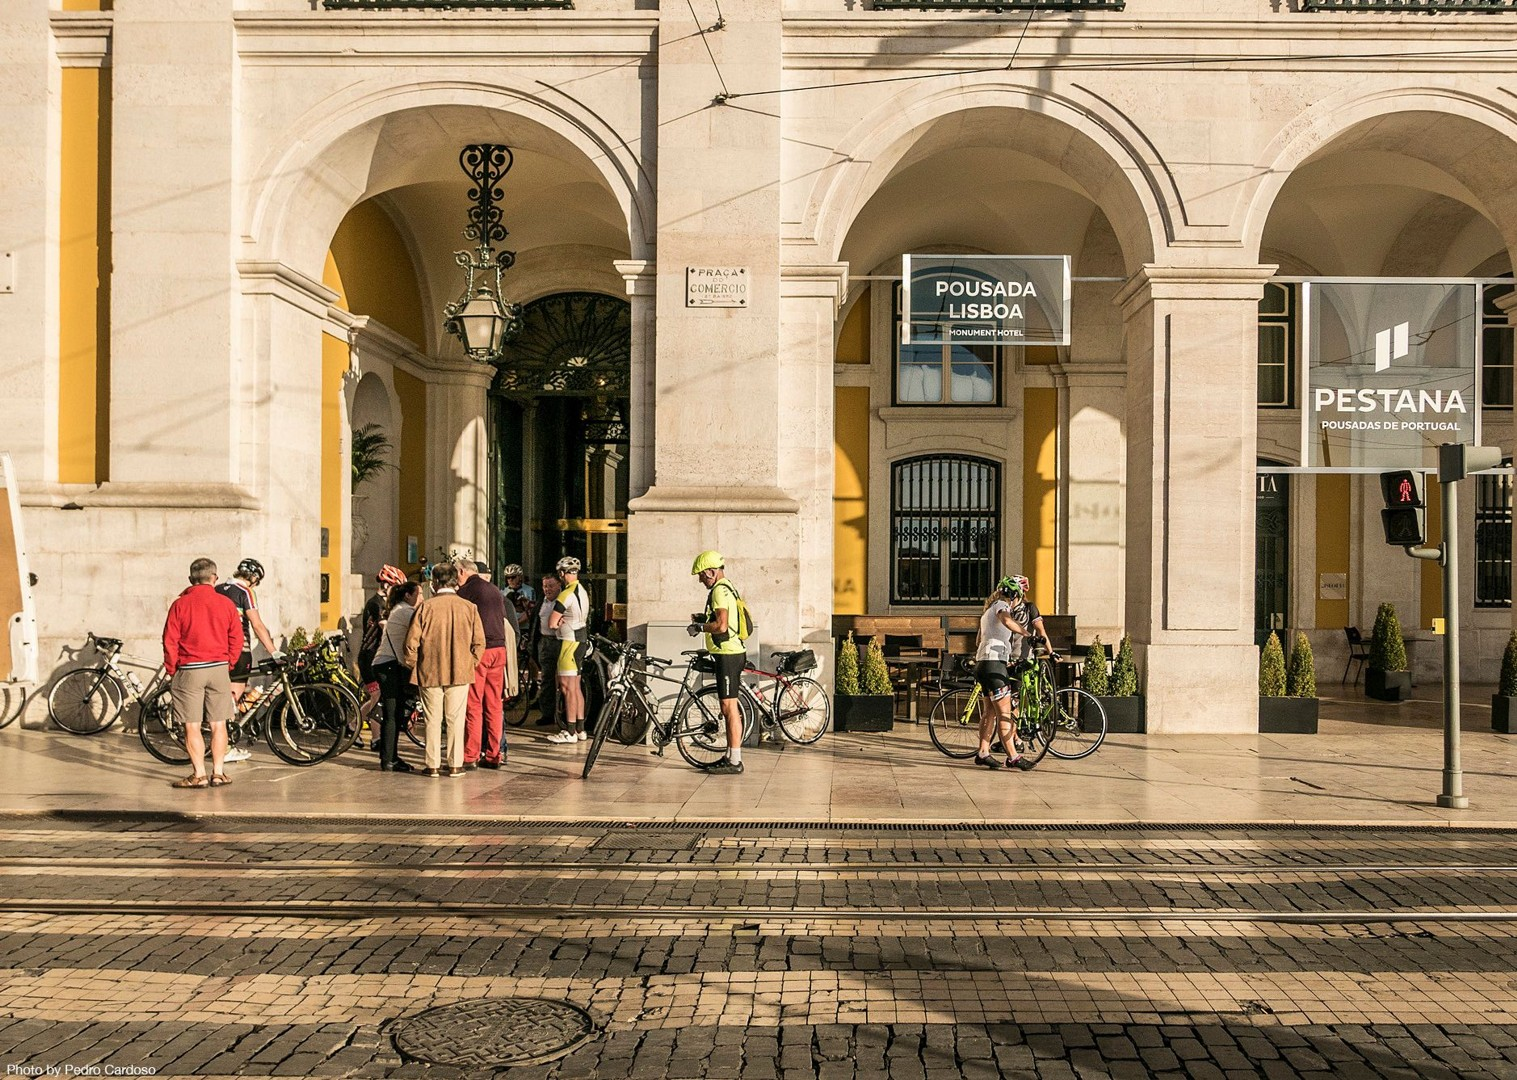 pestana-hotel-road-cycling-holiday-portugal.jpg - Portugal - Atlantic Escape - Guided Road Cycling Holiday - Road Cycling